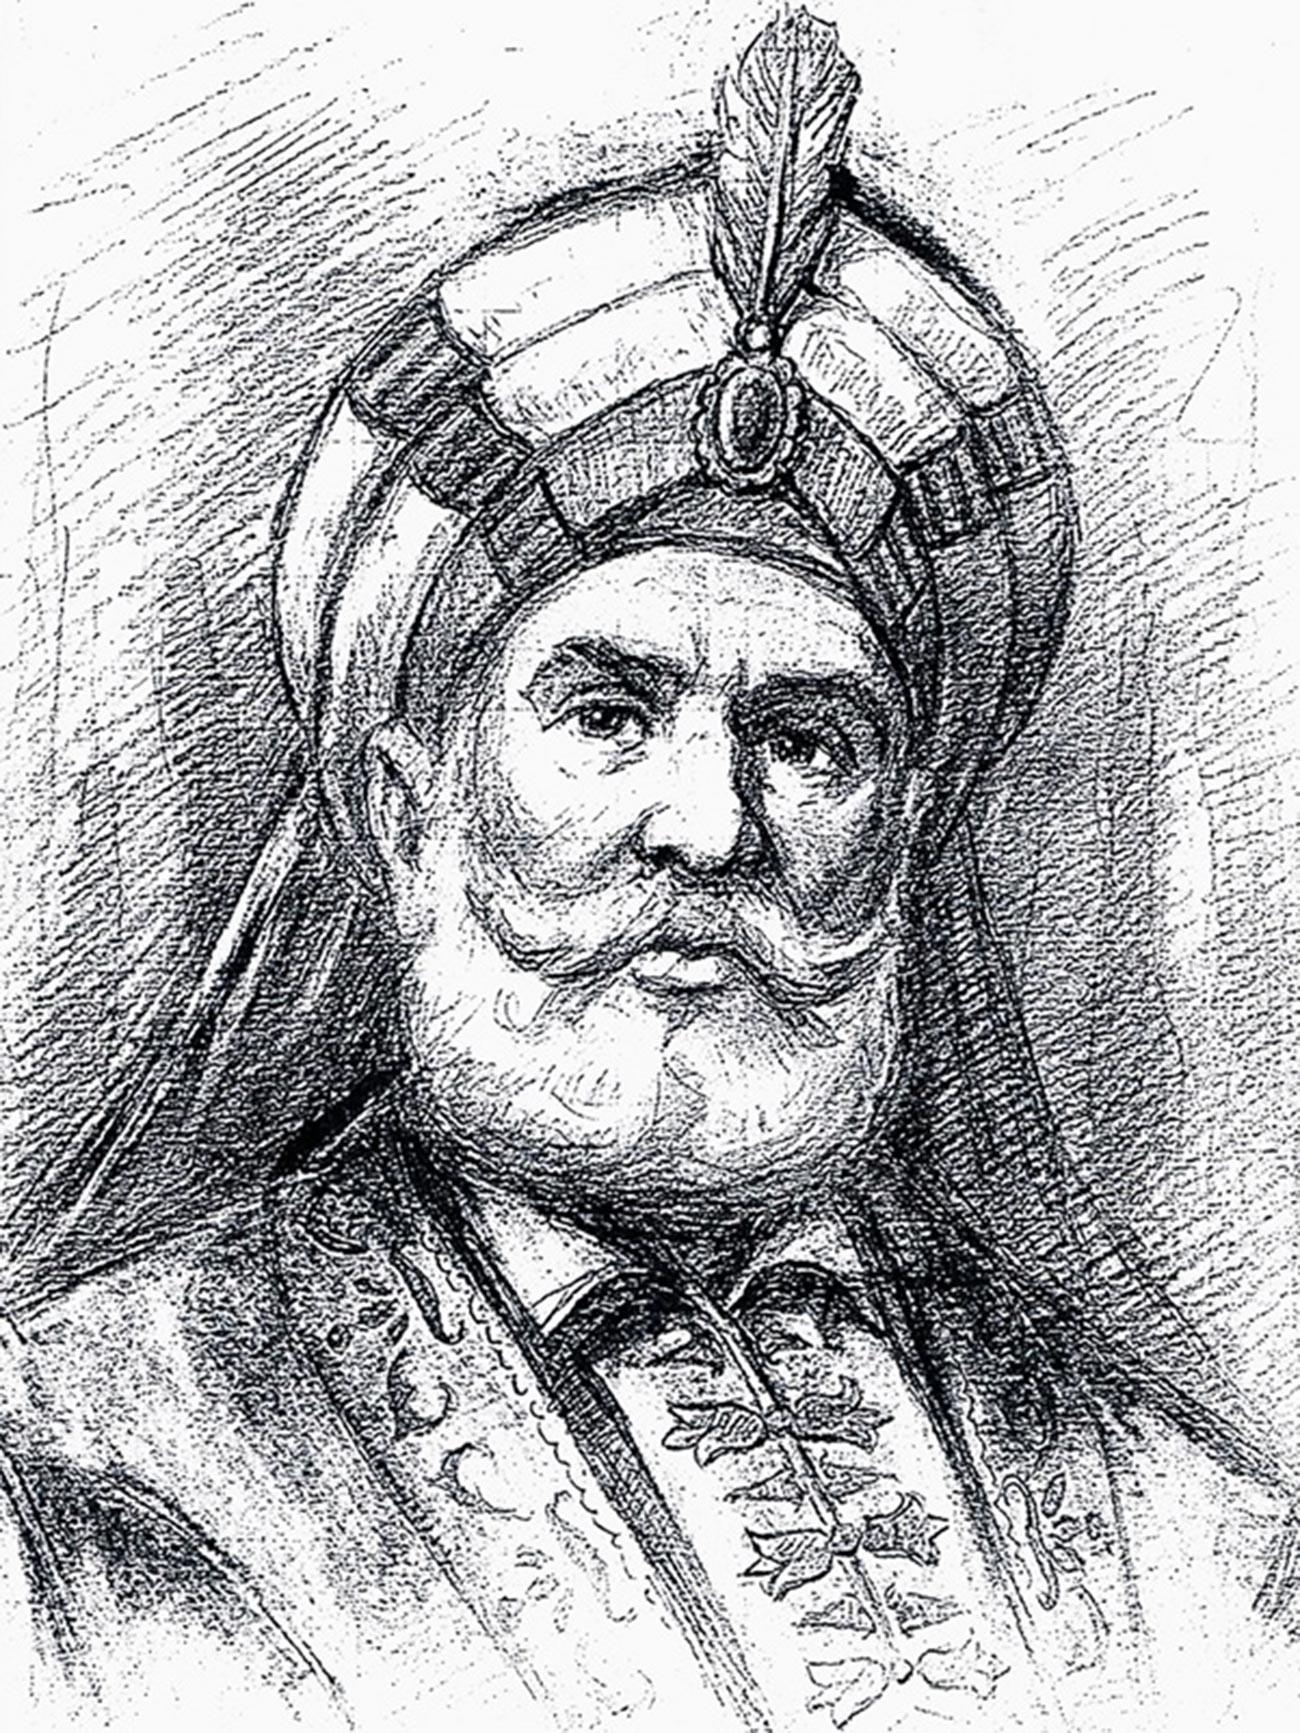 Lo sceicco Zahir al-Umar al-Zaydani